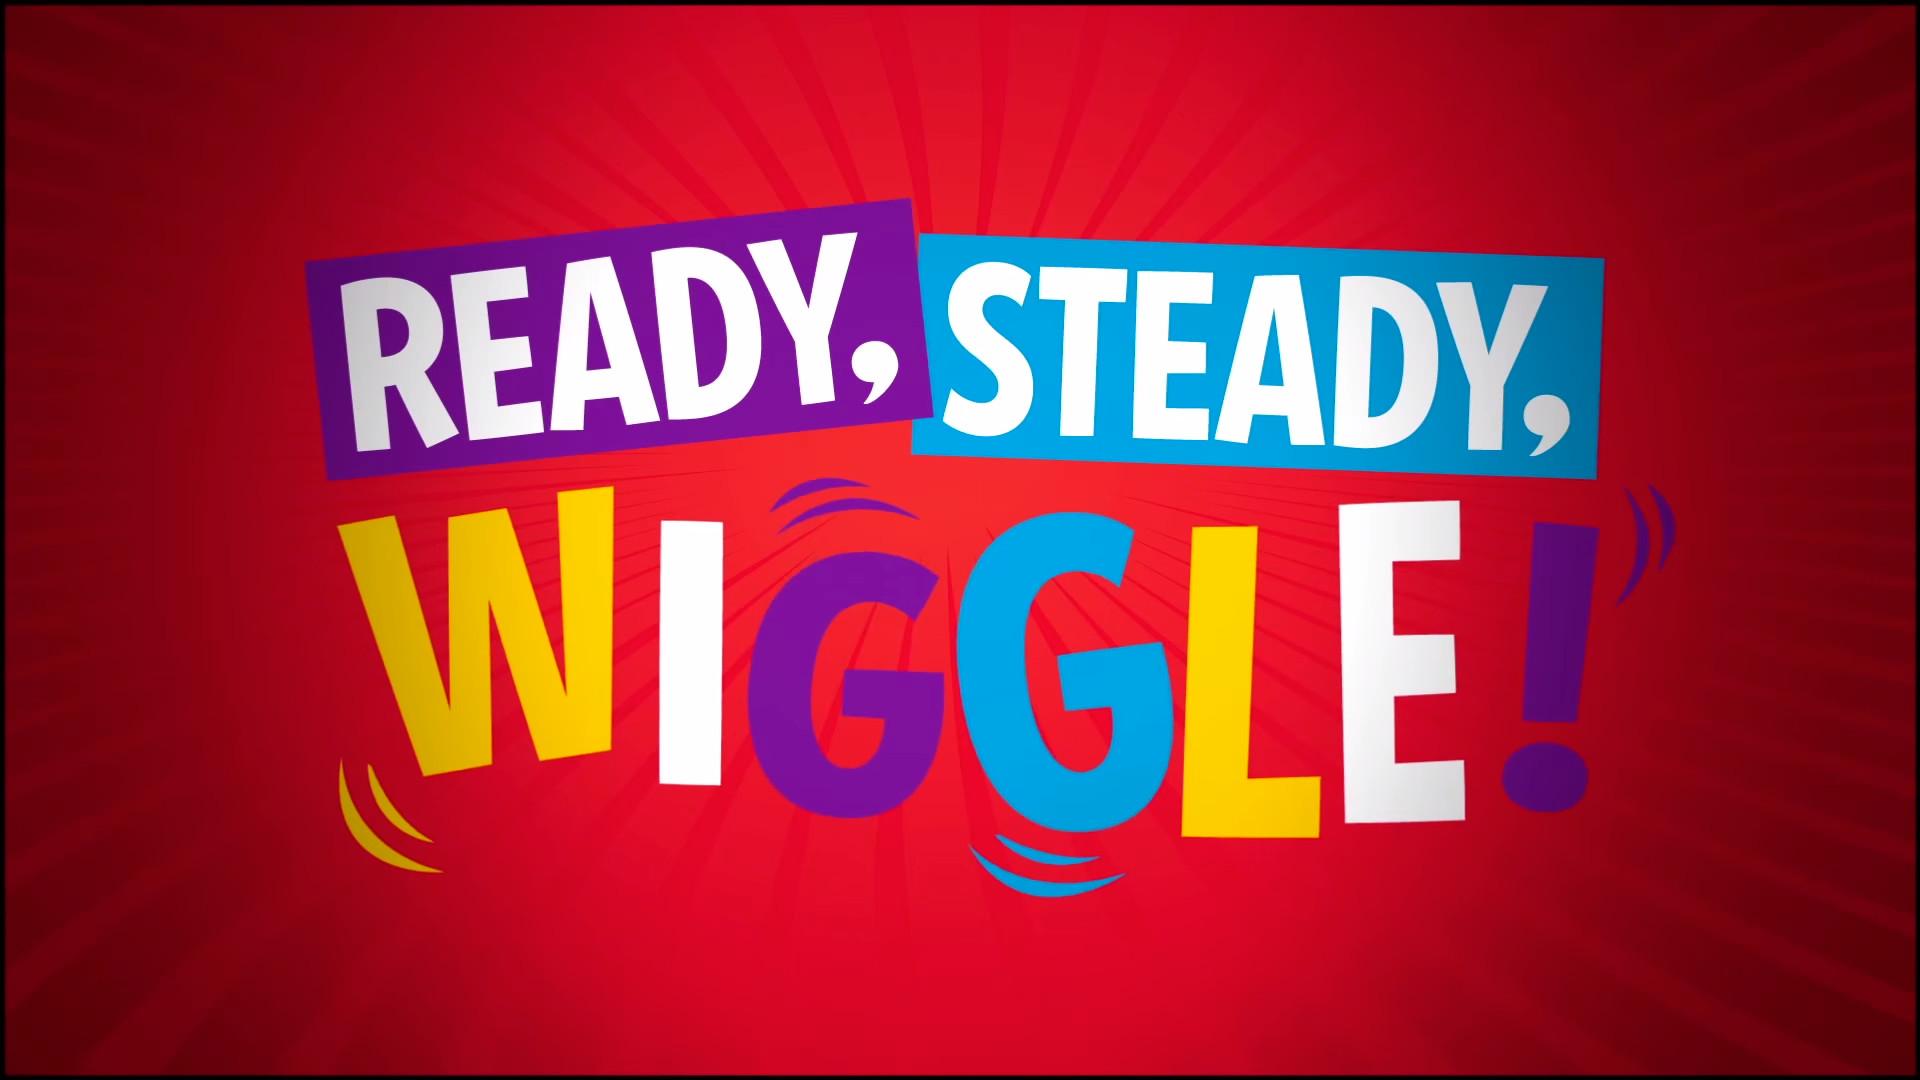 Ready steady wiggle games / Loews stonybrook